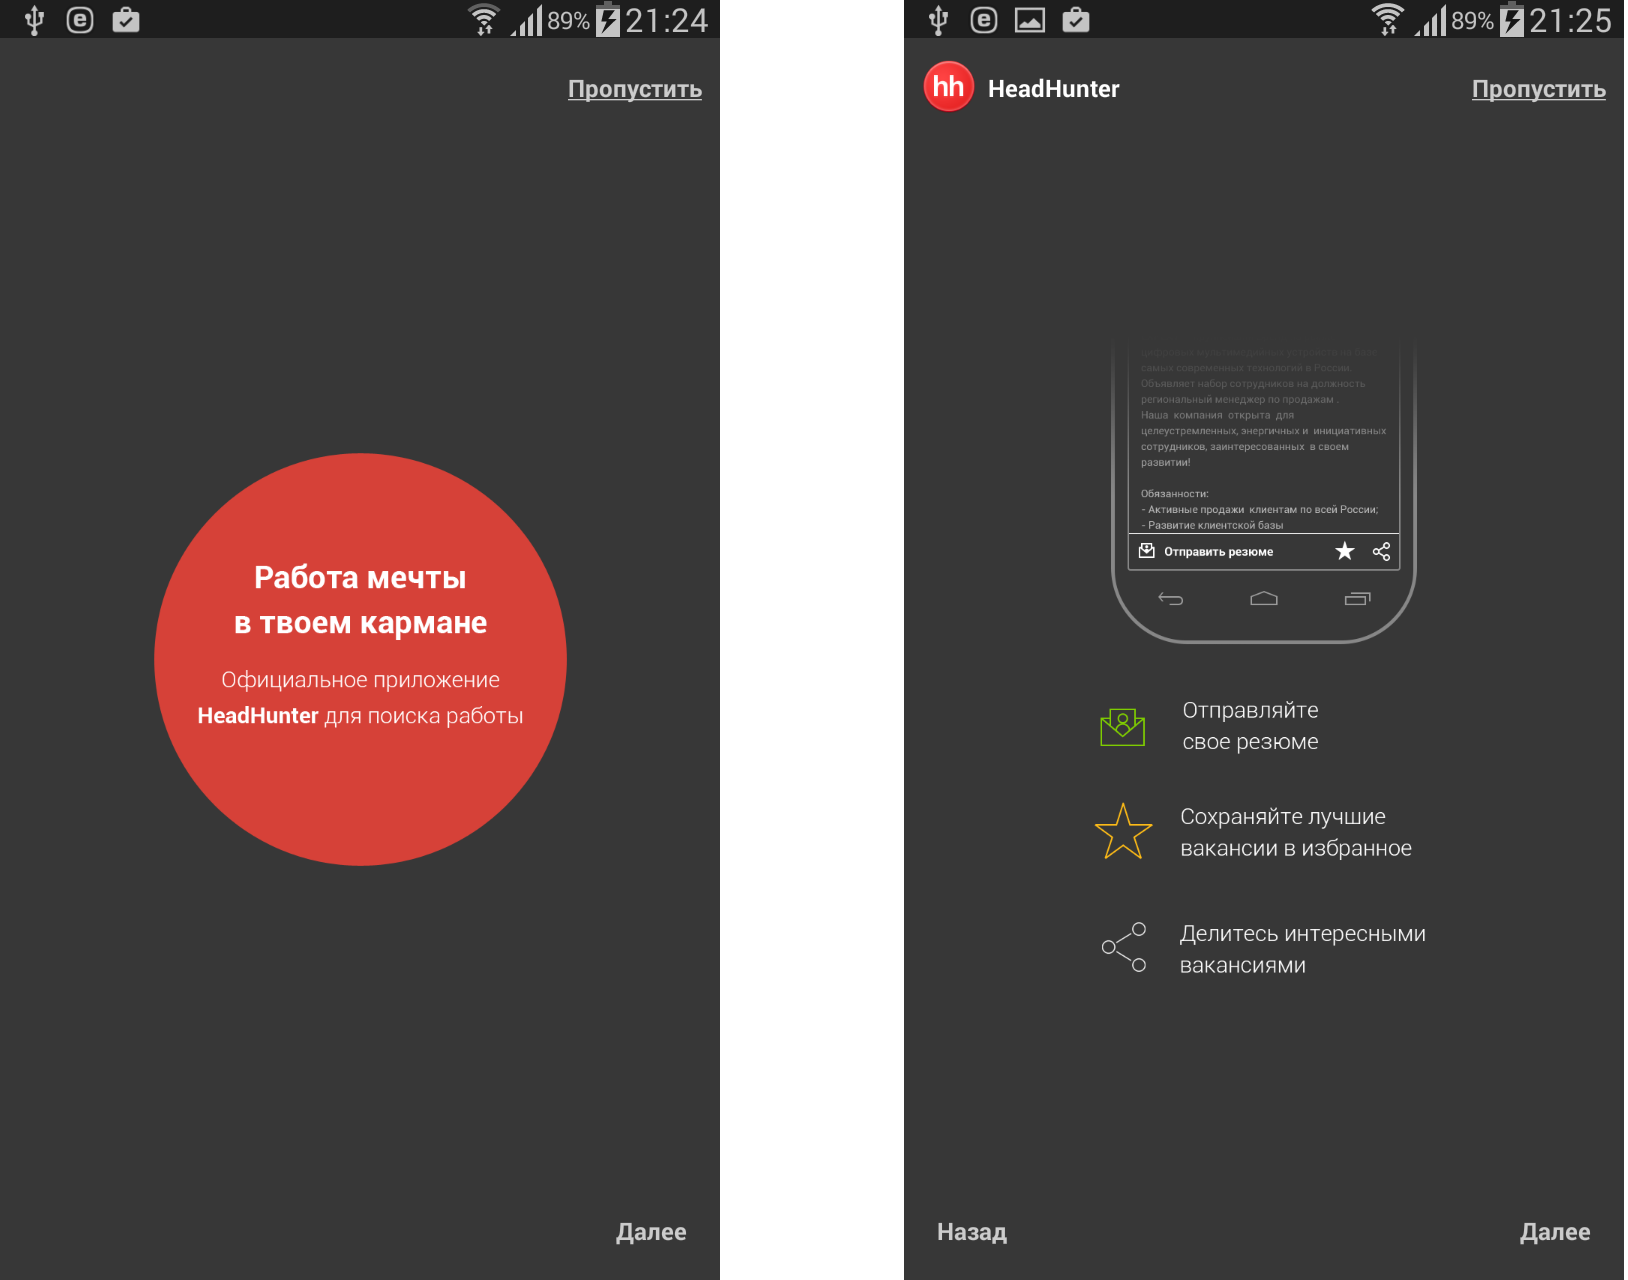 ТОП-20 приложений для Android - HeadHunter